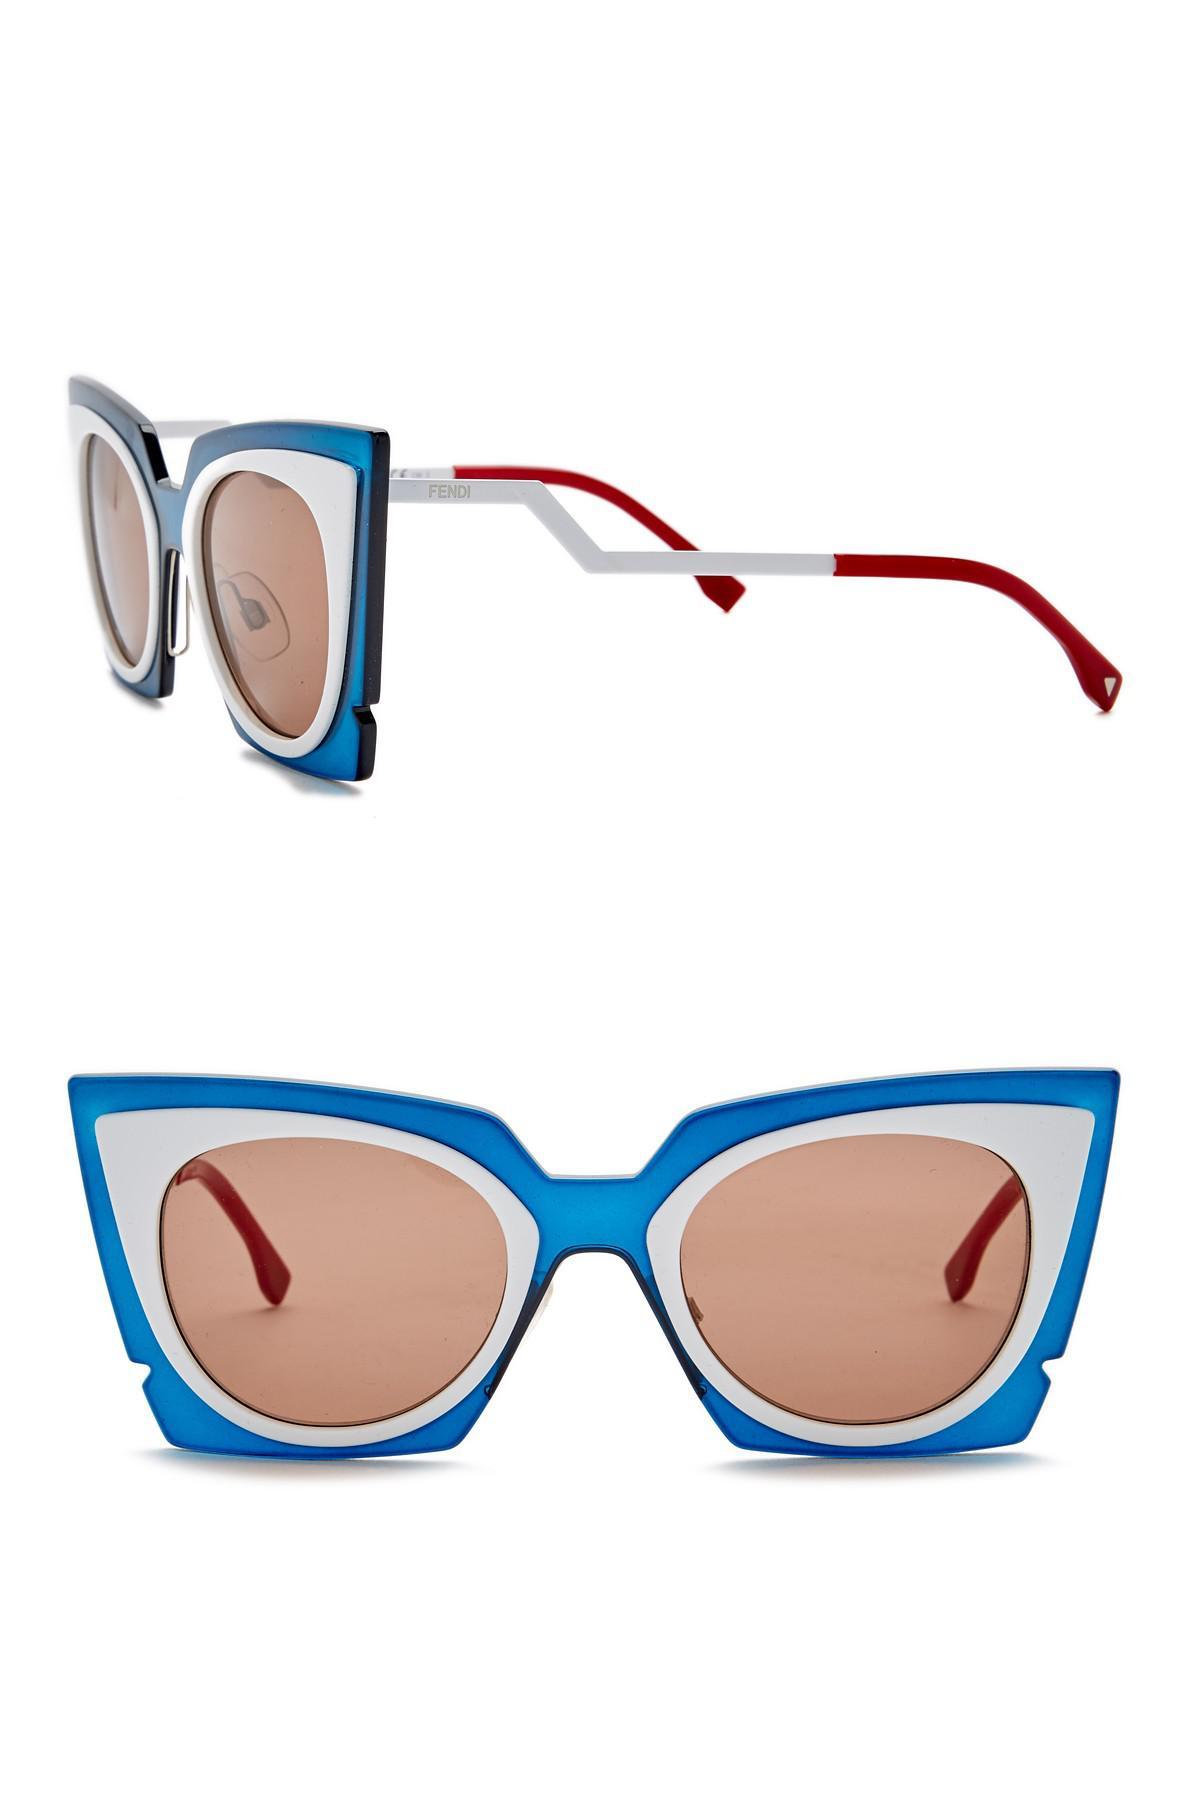 5f402a3738f89 Lyst - Fendi 49mm Modified Butterfly Sunglasses in Blue for Men